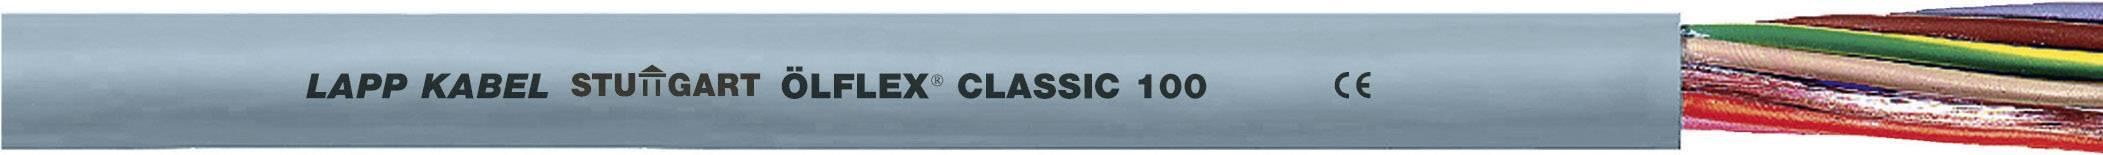 Kabel LappKabel Ölflex CLASSIC 100 18G1,5 (0010074), PVC, 14,4 mm, 500 V, šedá, 50 m